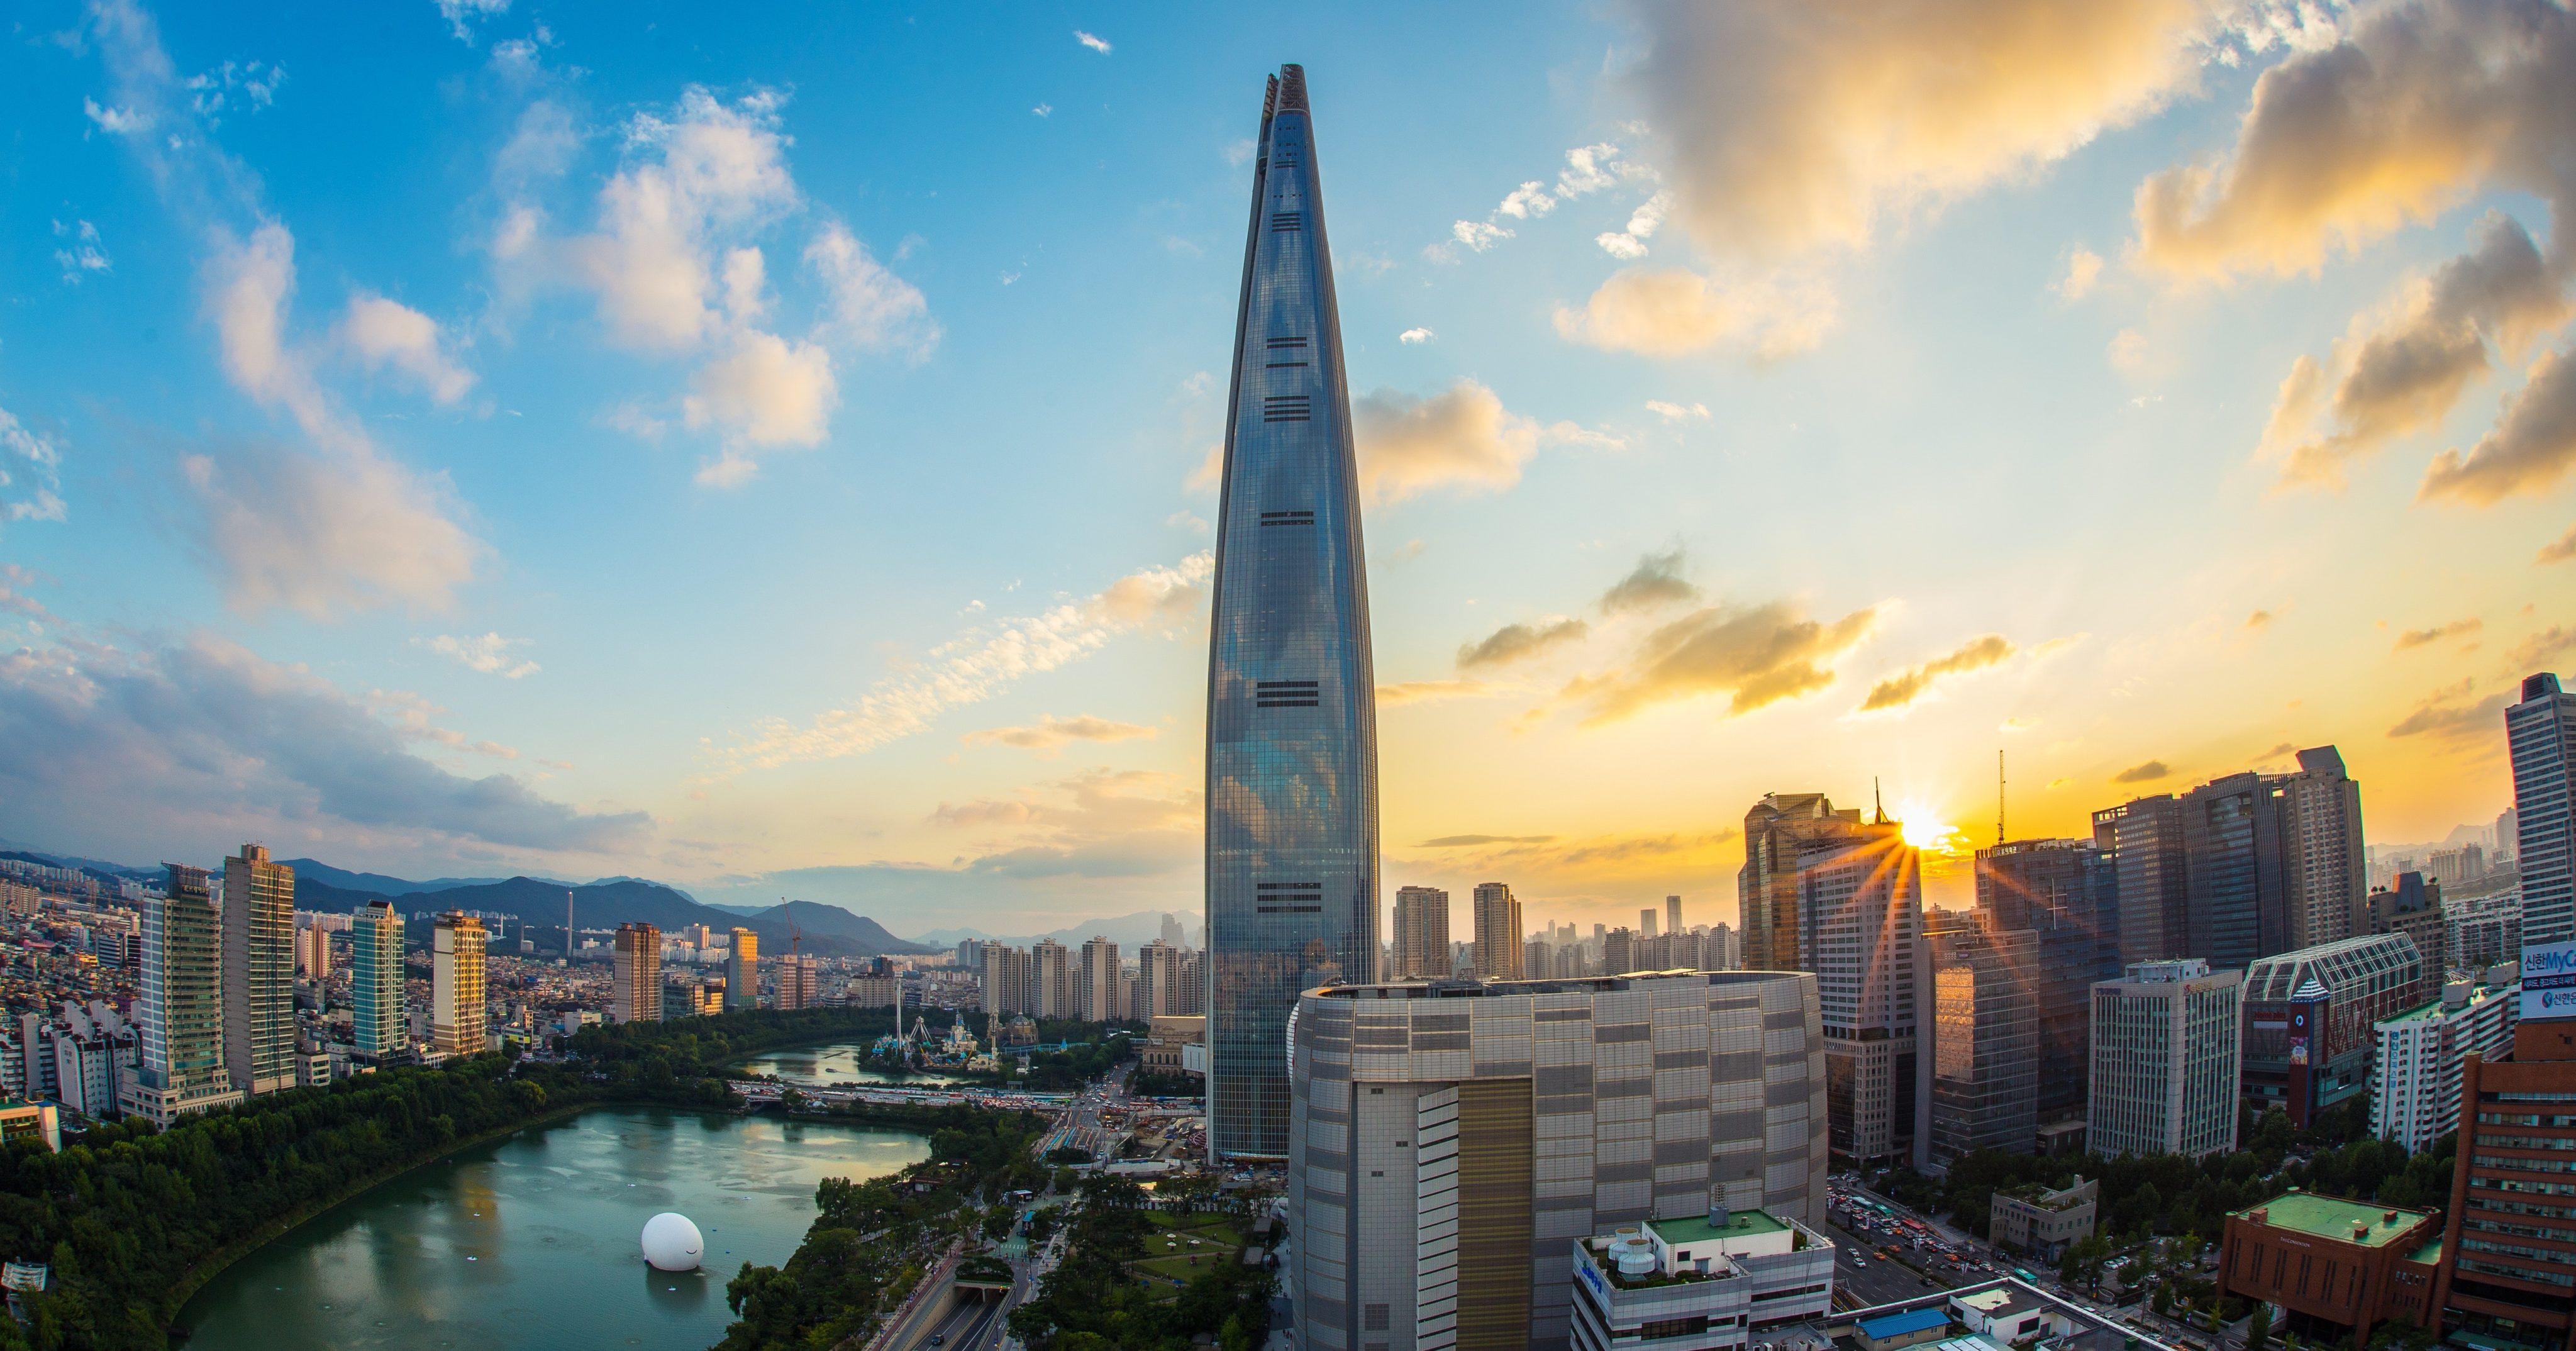 south koreas hi tech city - HD1920×1280